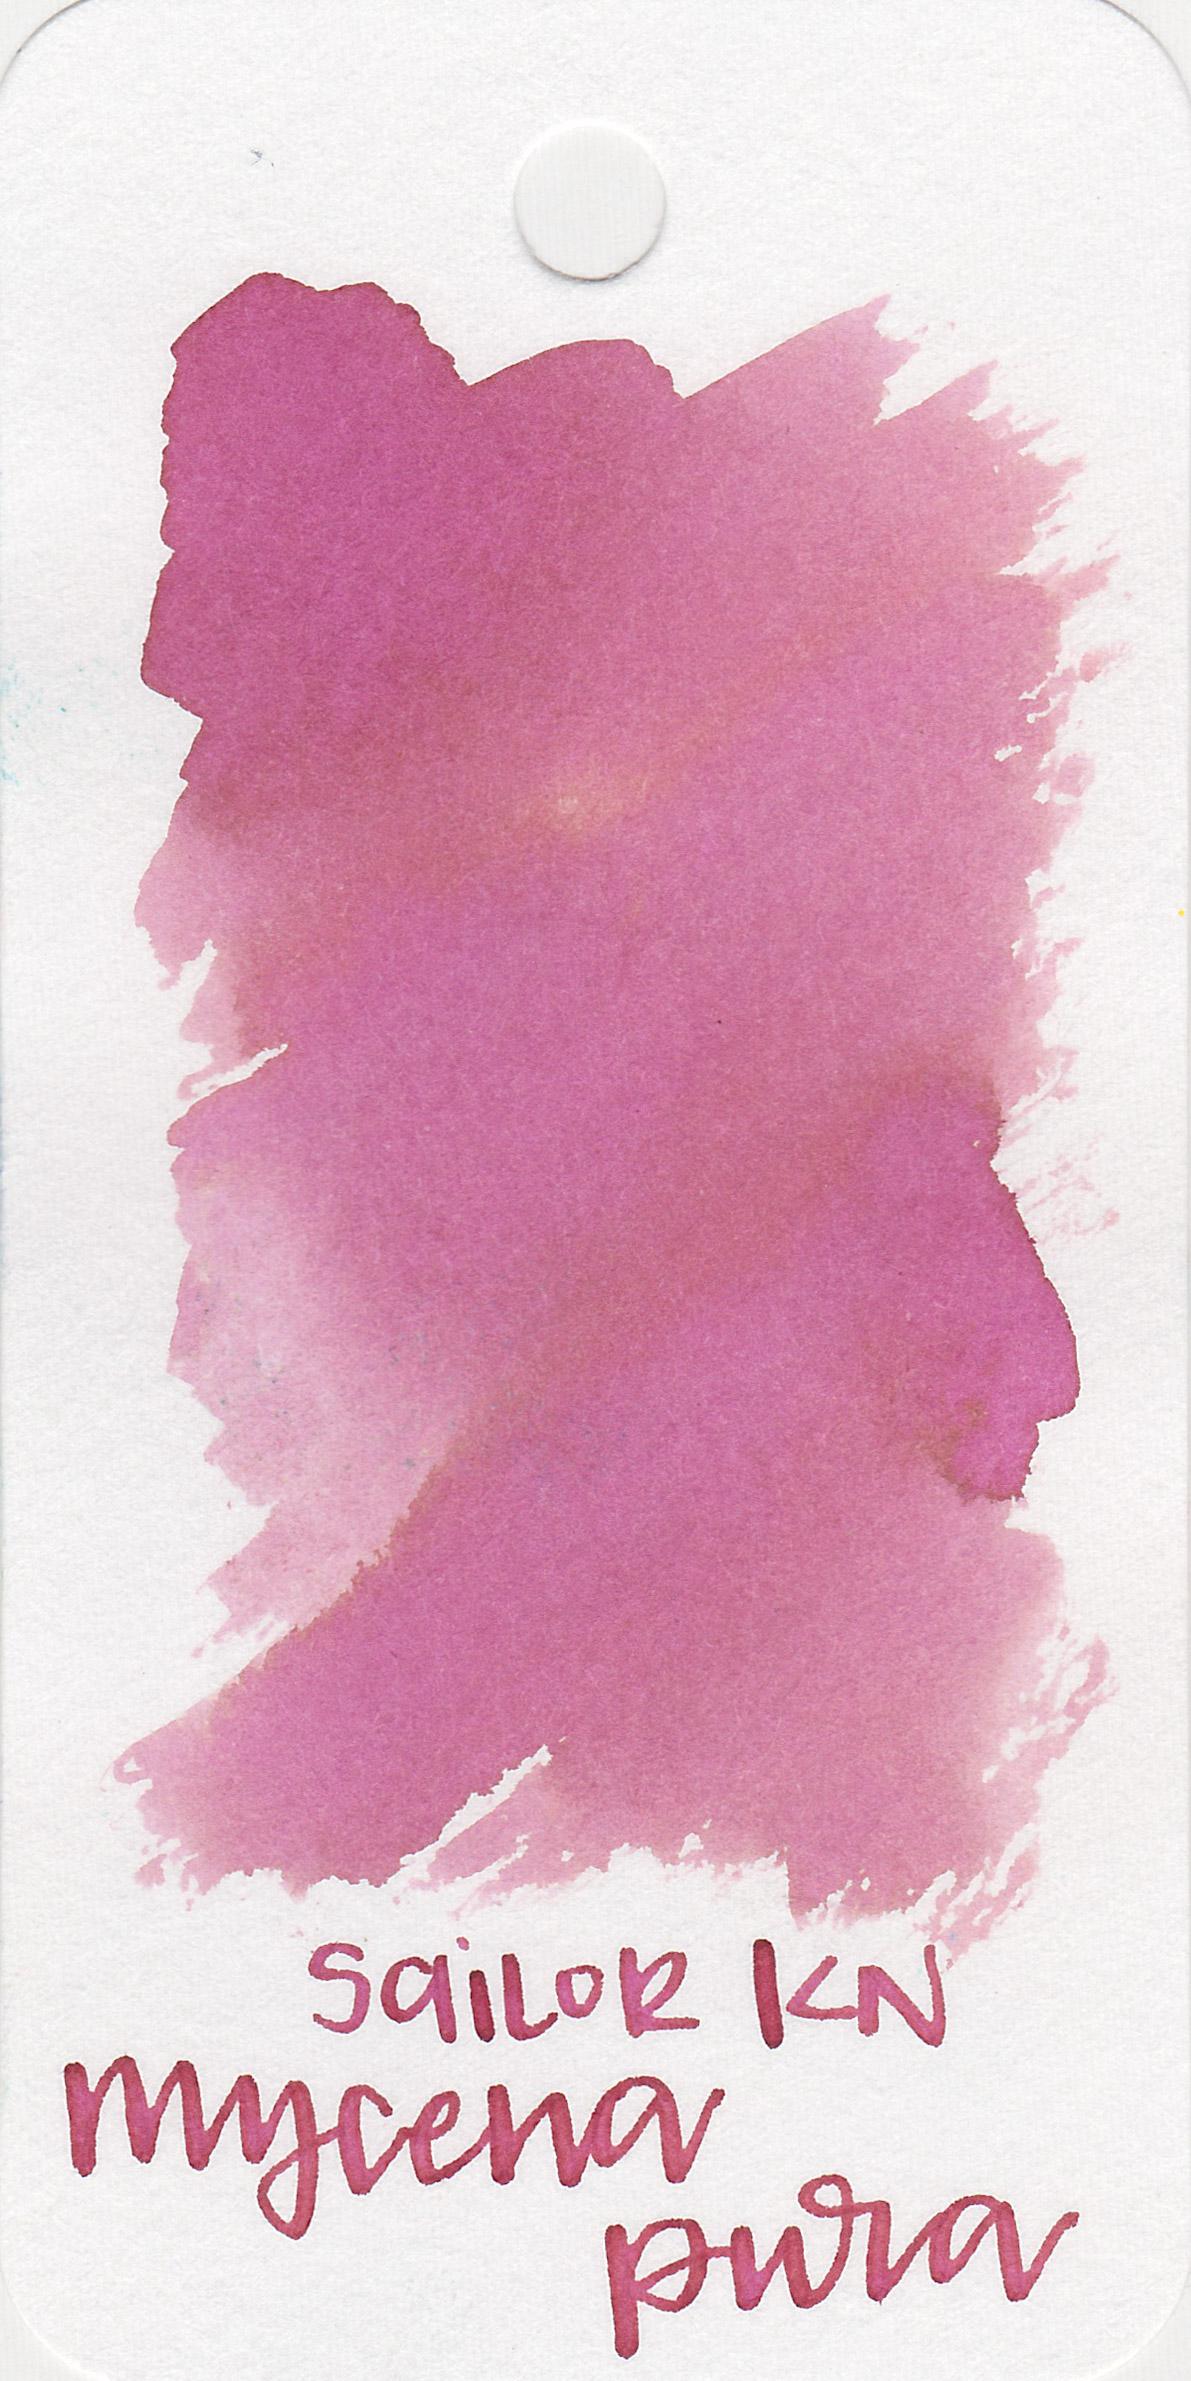 kn-mycena-pura-1.jpg